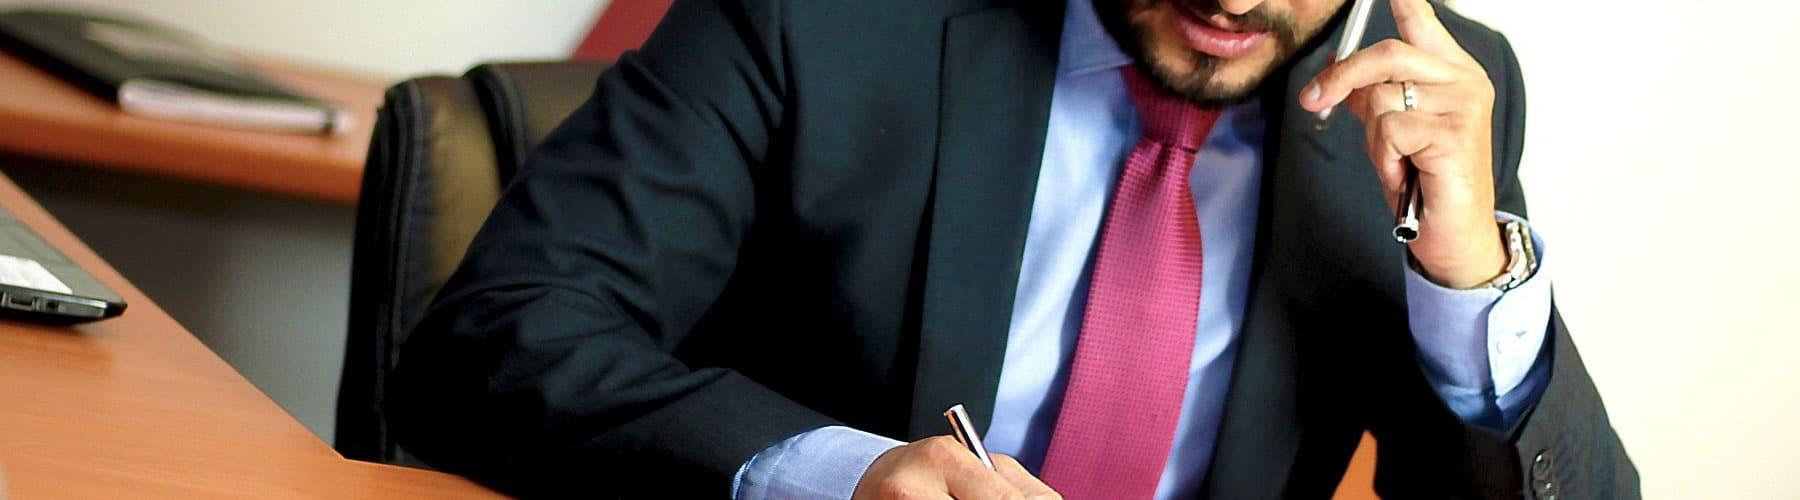 despacho-abogados-en-murcia-LABORDA-MONERRI-MURCIA-min (1)